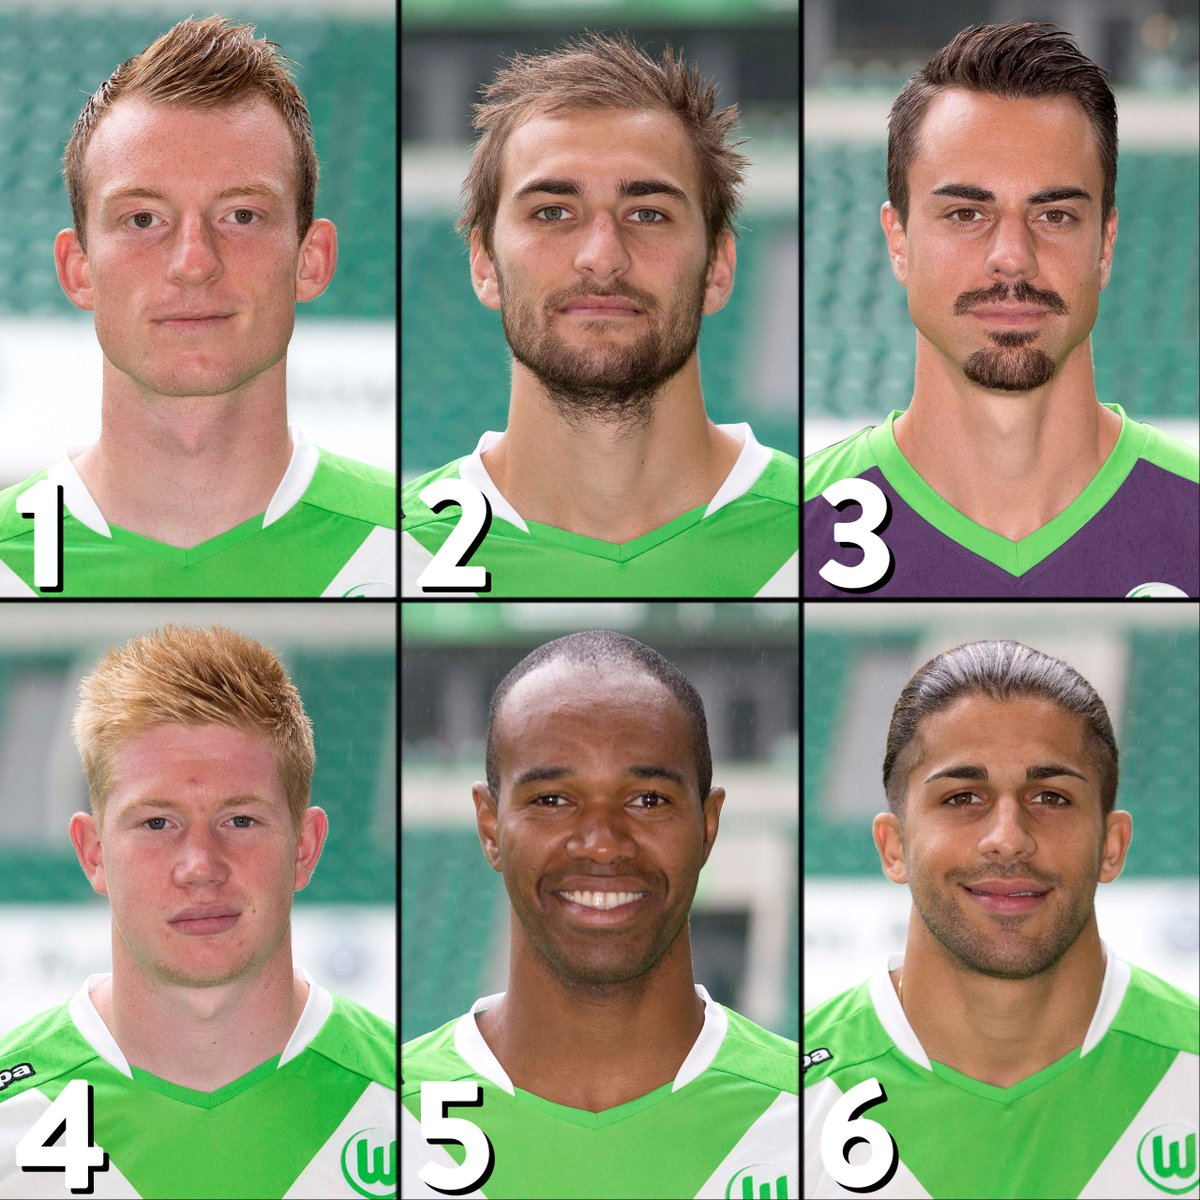 Wolfsburg heroes 2014/15 🐺💚 Pick 2...  1⃣ Maximilian Arnold 2⃣ Bas Dost 3⃣ Diego Benaglio 4⃣ Kevin De Bruyne 5⃣ Naldo 6⃣ Ricardo Rodríguez  #UEL   @VfL_Wolfsburg https://t.co/dbQx0kllyZ